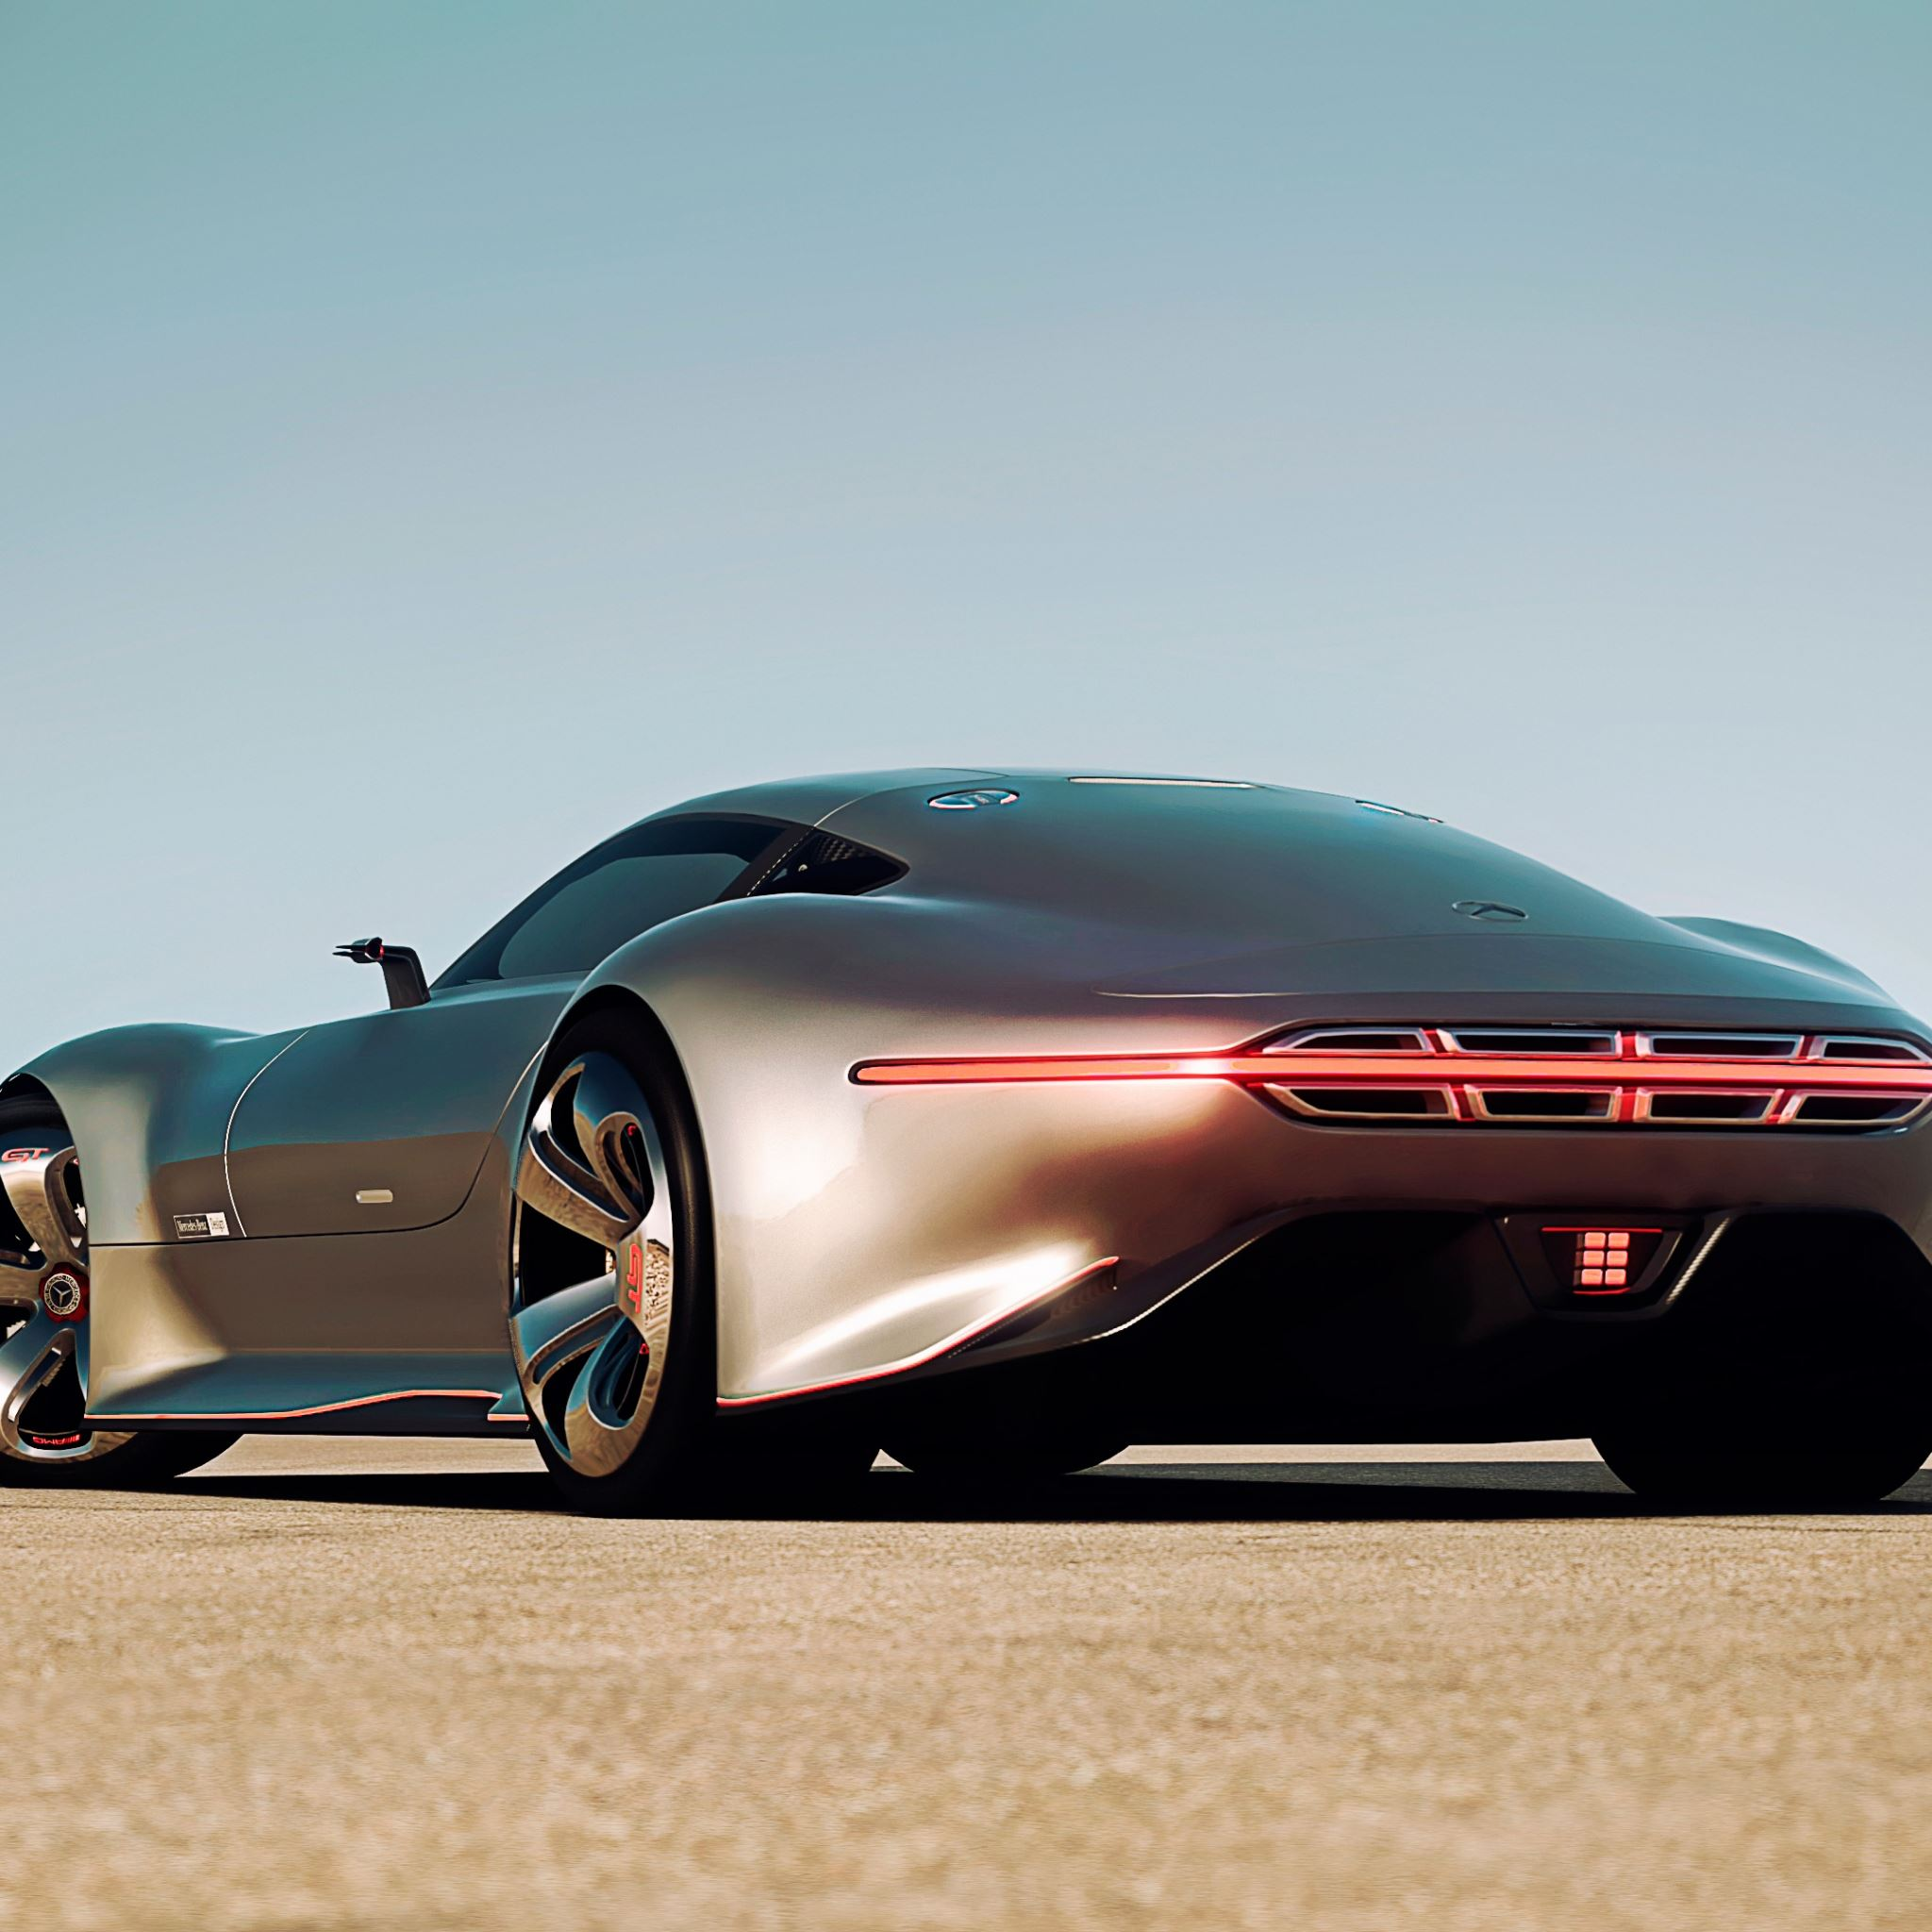 Mercedes Benz Amg Vision Gran Turismo Silver Stunner IPad